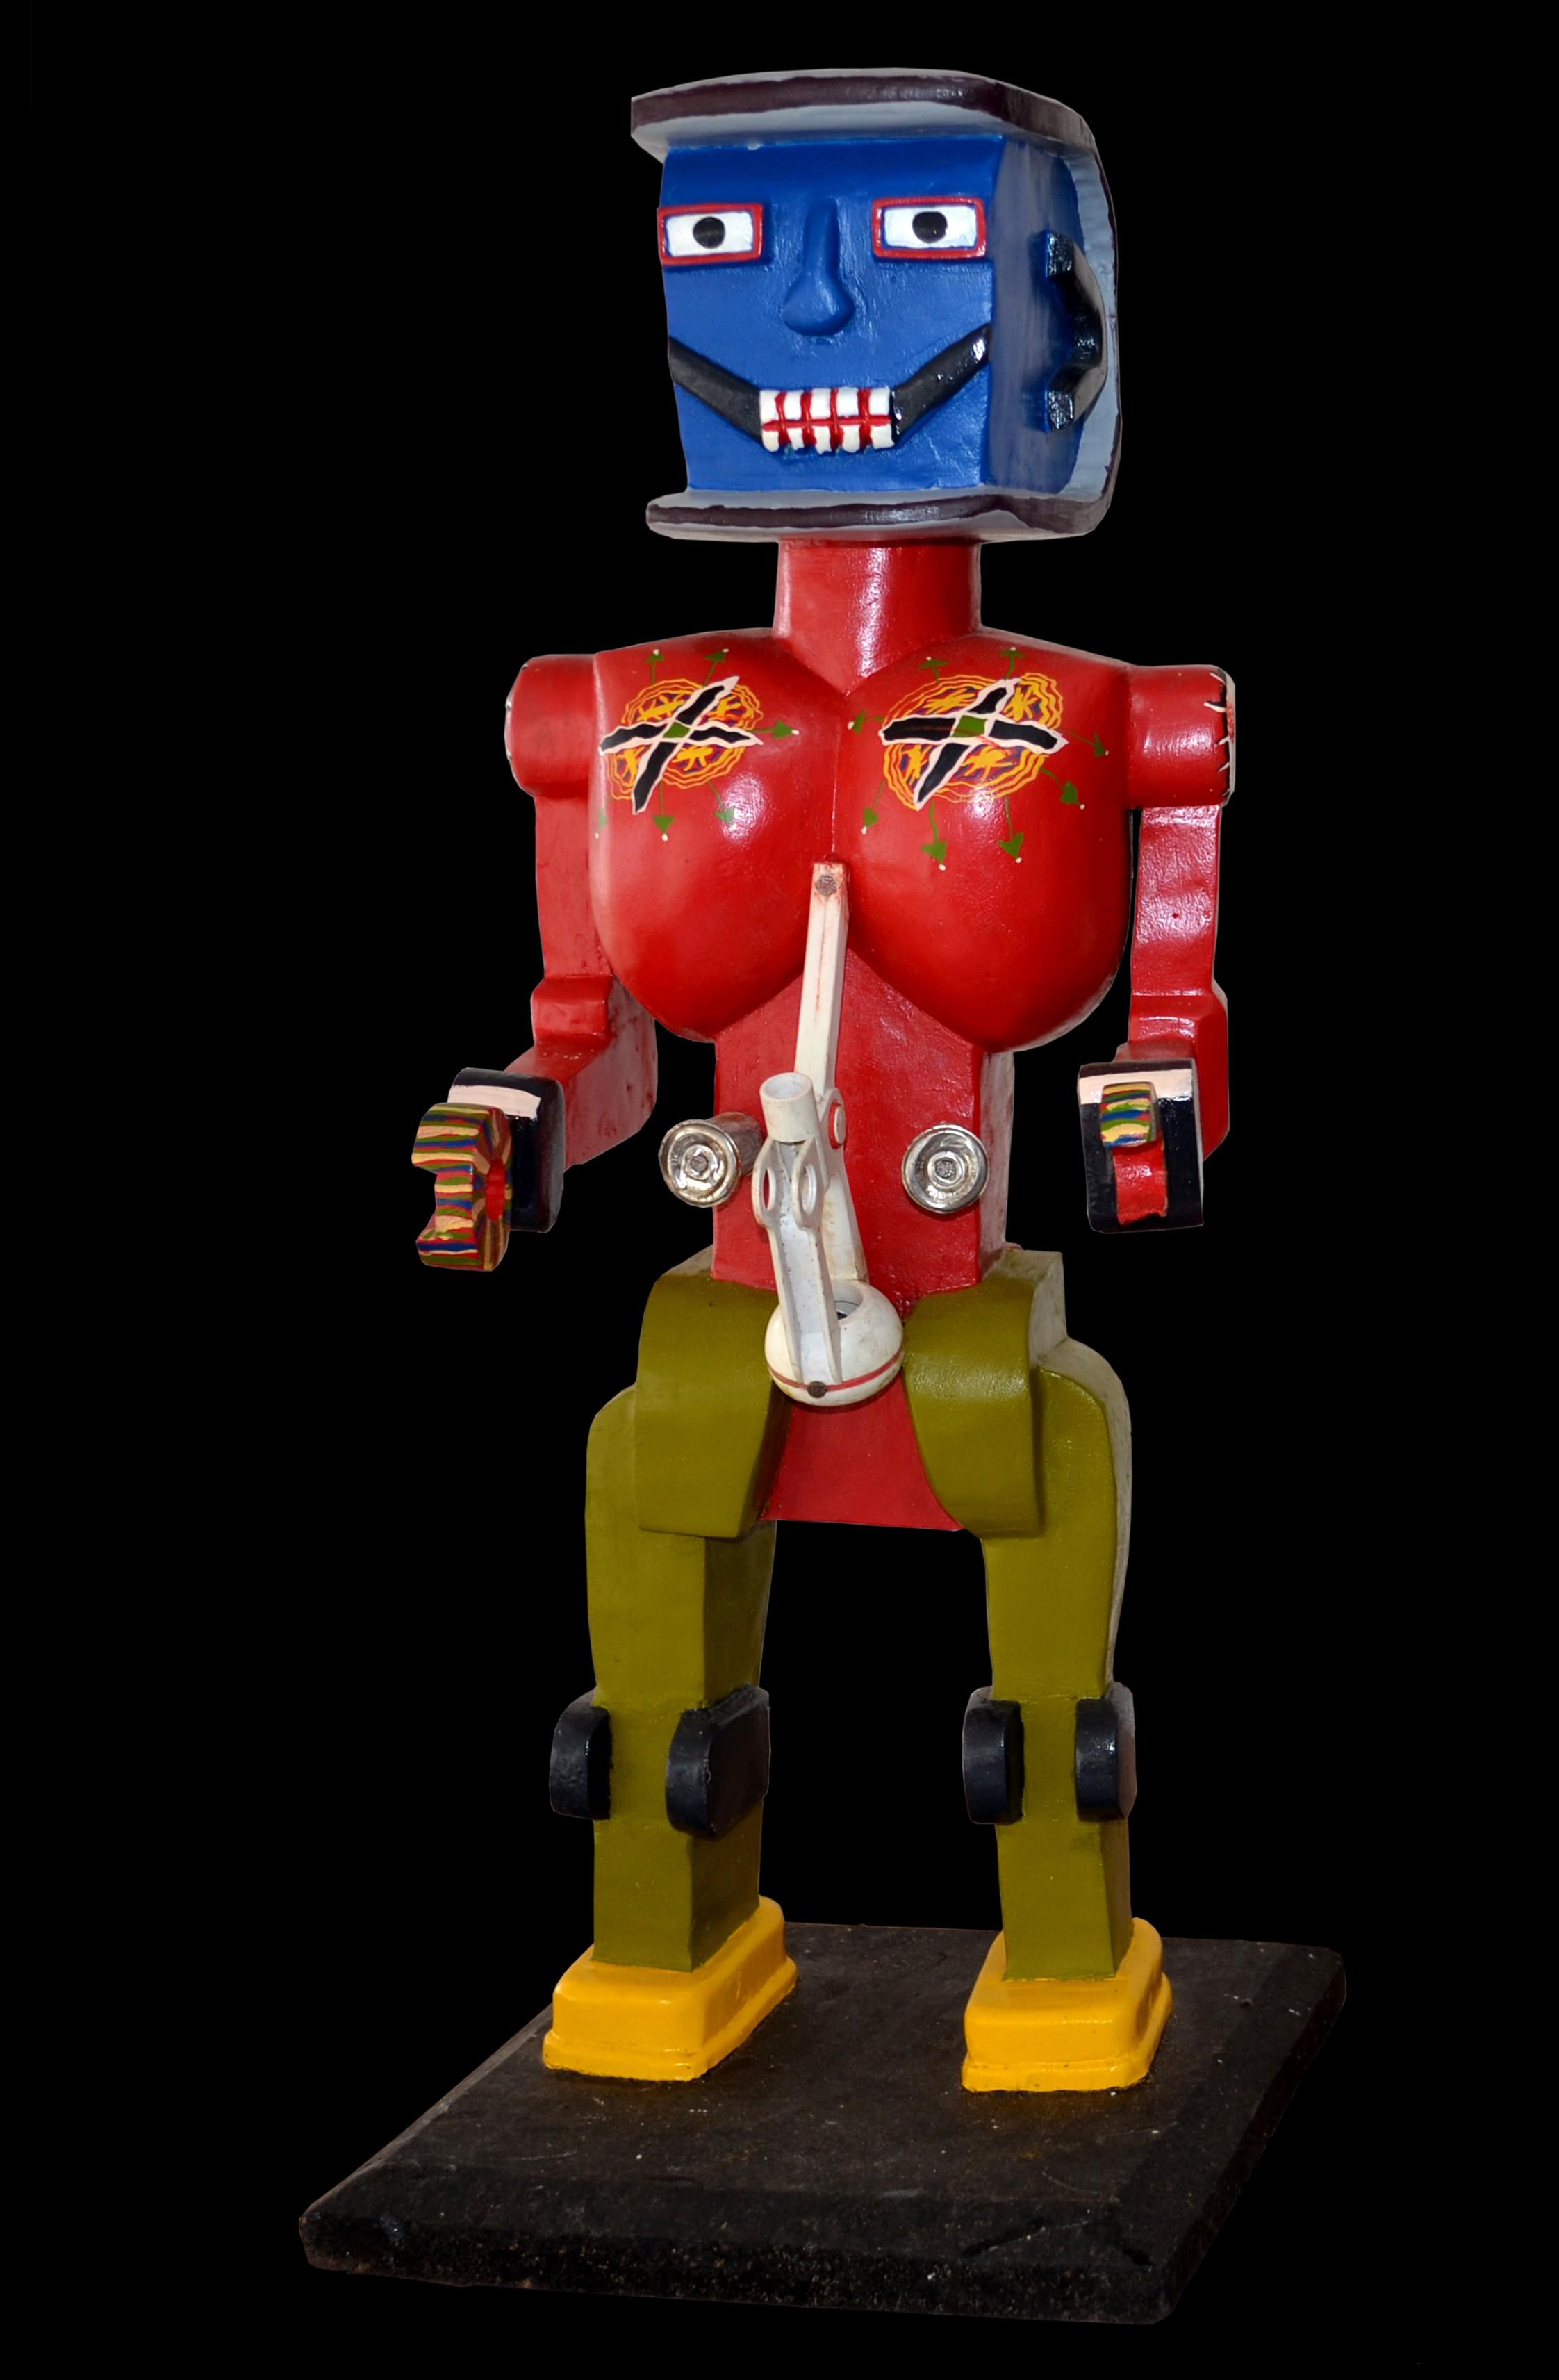 Robot red with blue head - Sculpture polychrome - Camara Demba - 2012